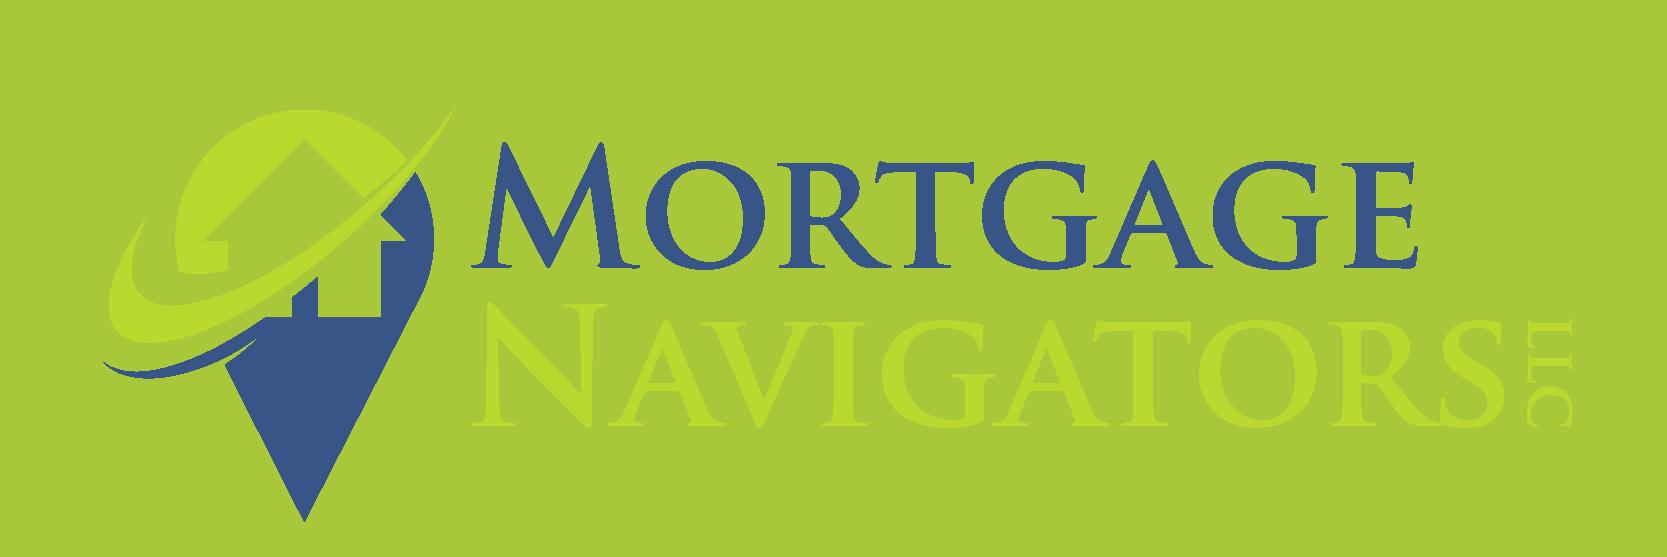 mortgage navigators, llc logo